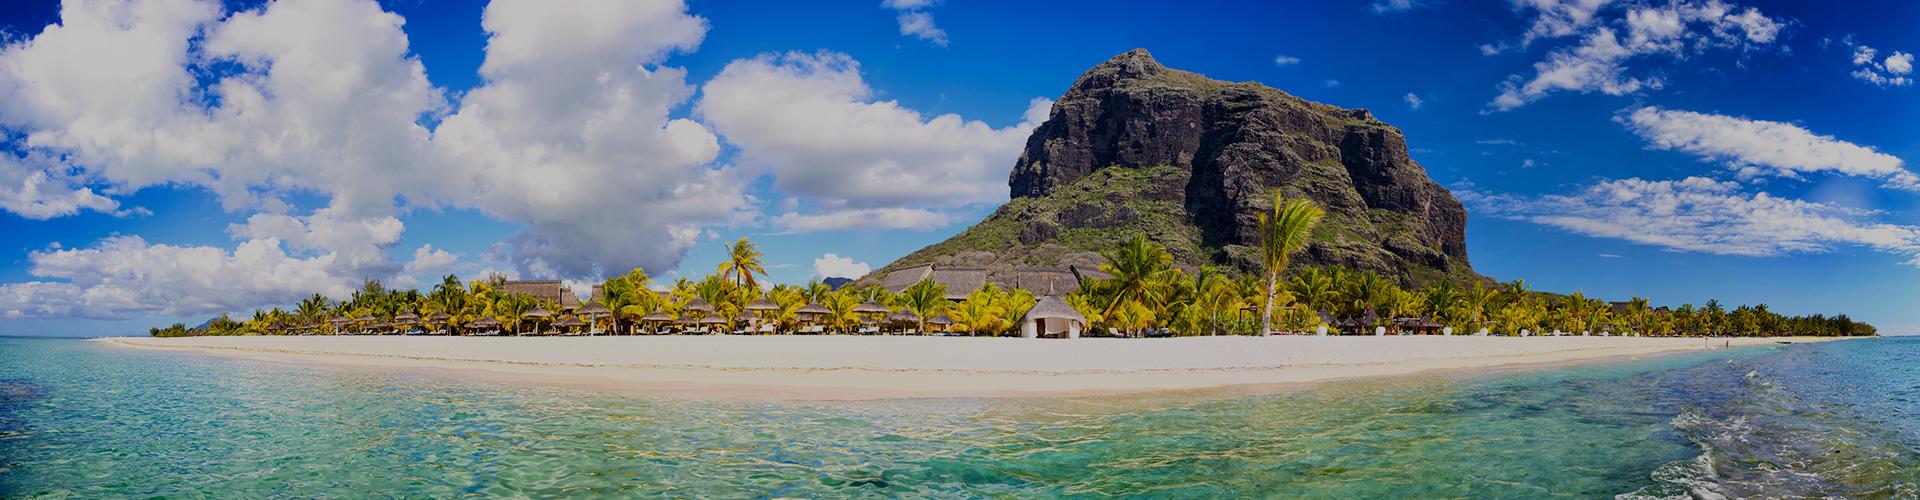 Landmark photograph of Mauritius